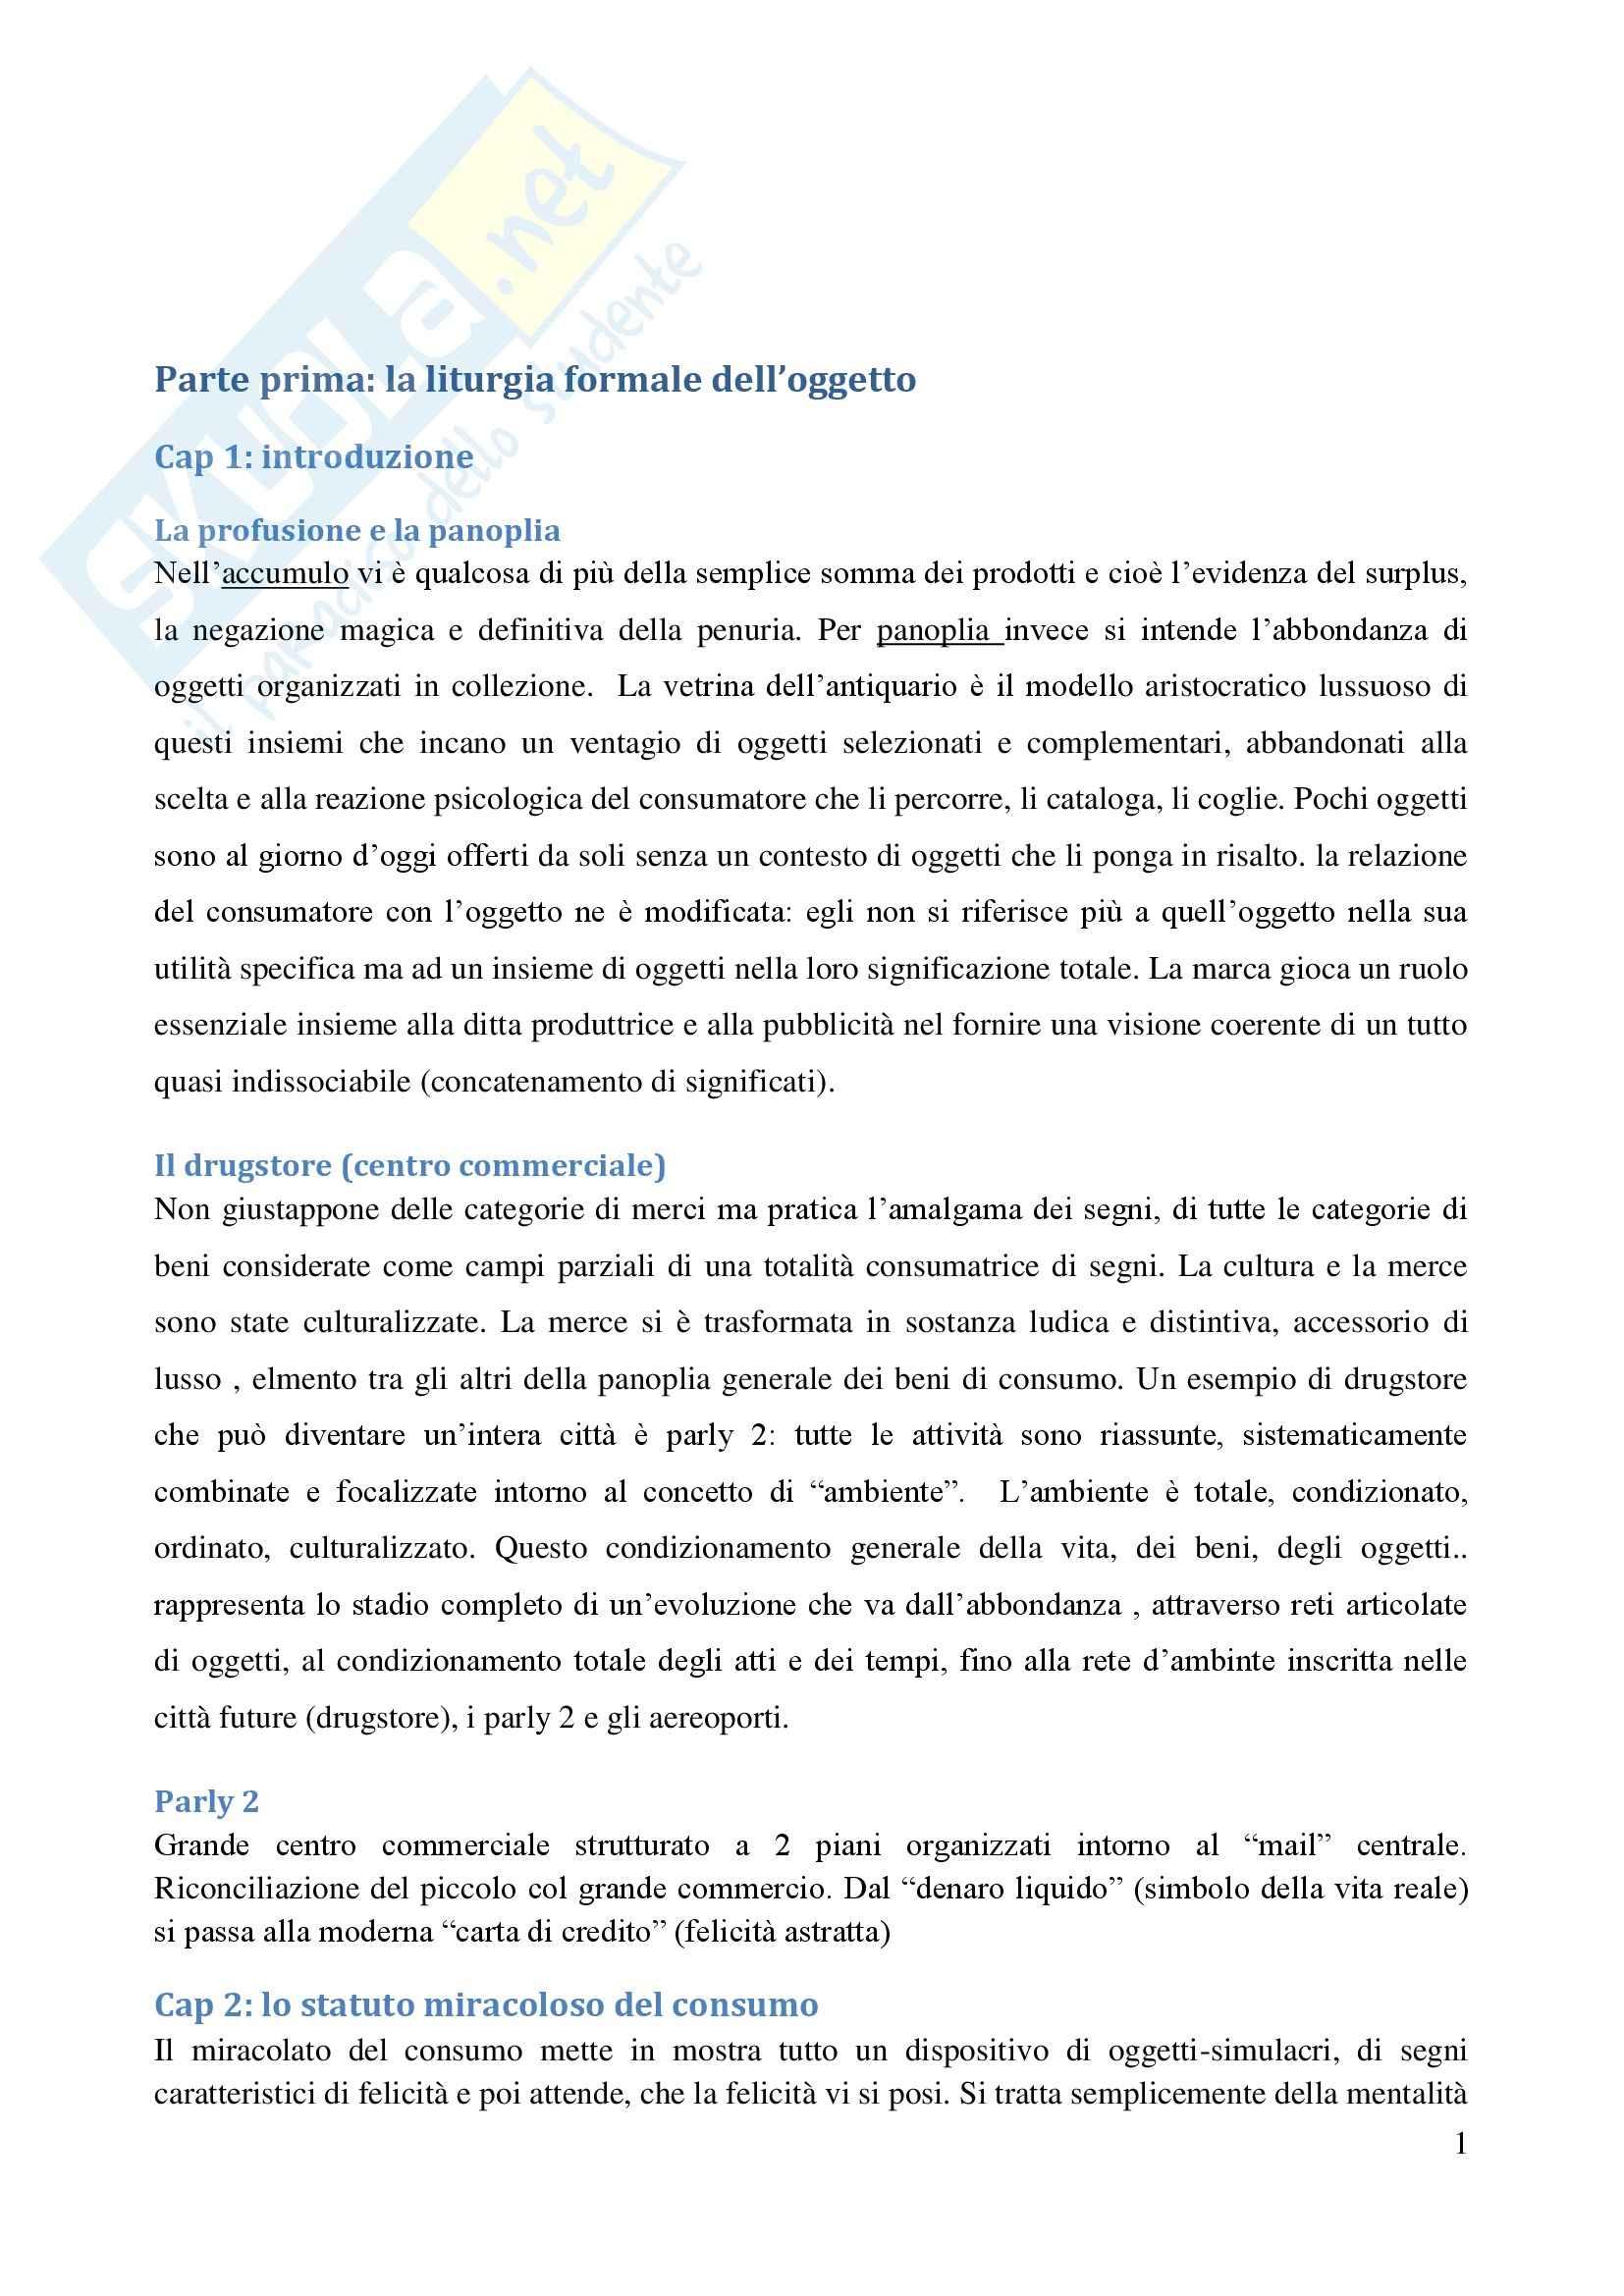 appunto R. De Biasi Sociologia generale